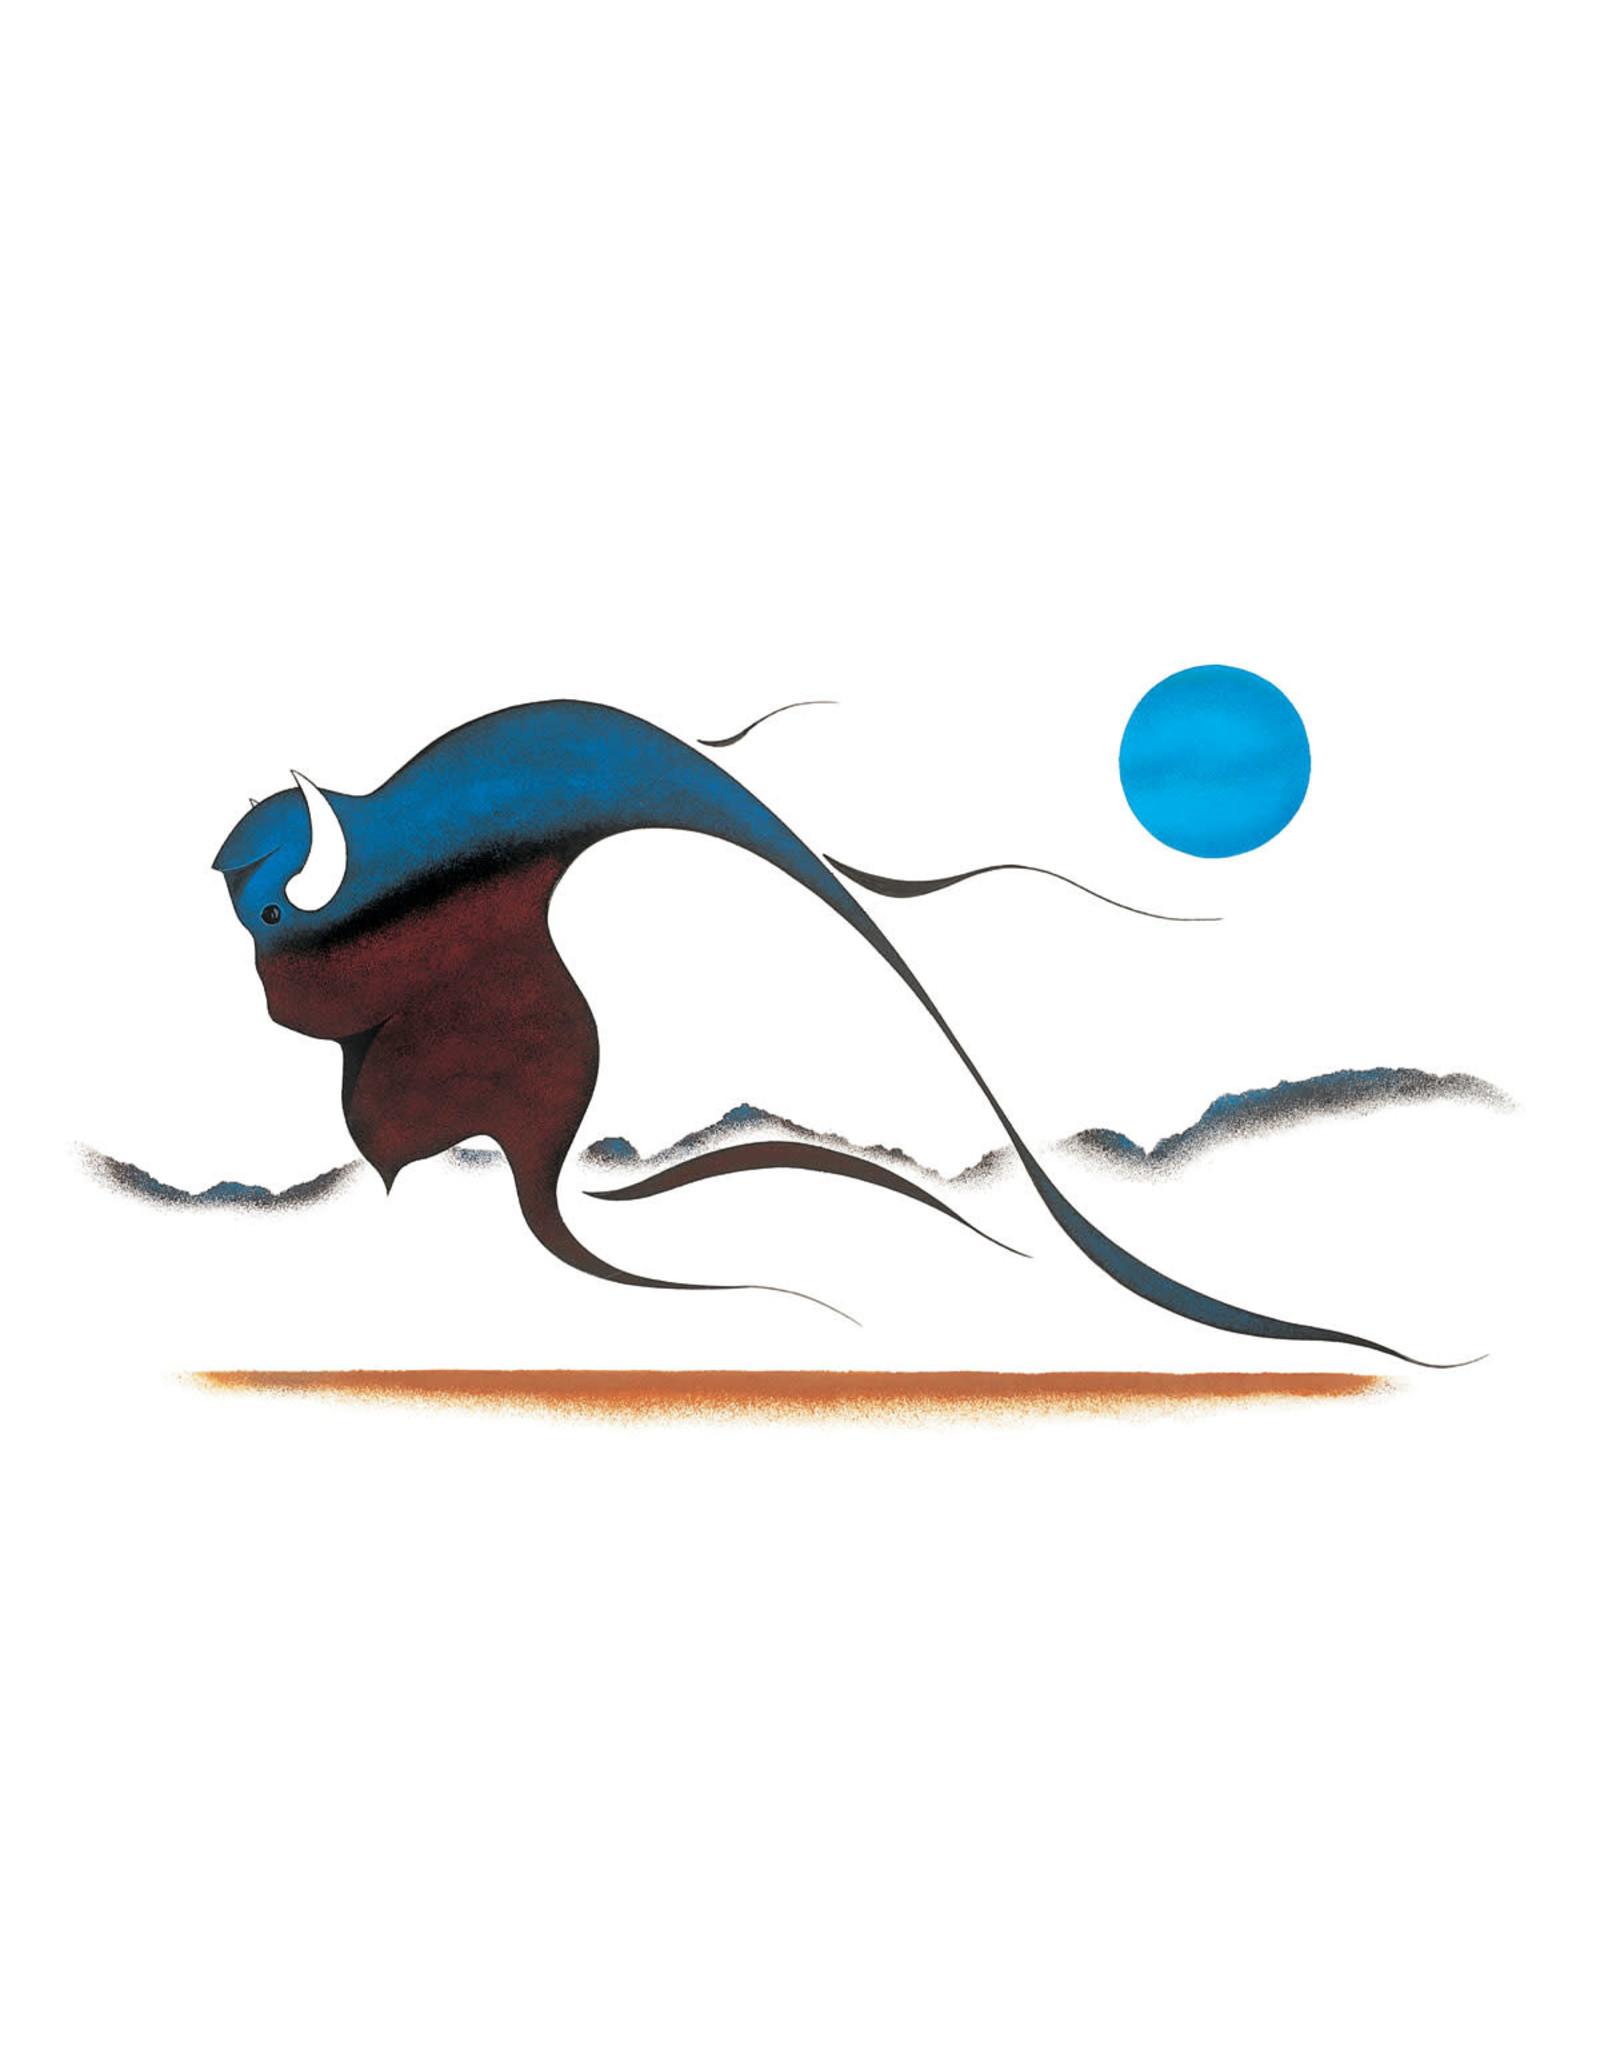 Buffalo Spirit par Isaac Bignell Édition Limitée Encadrée